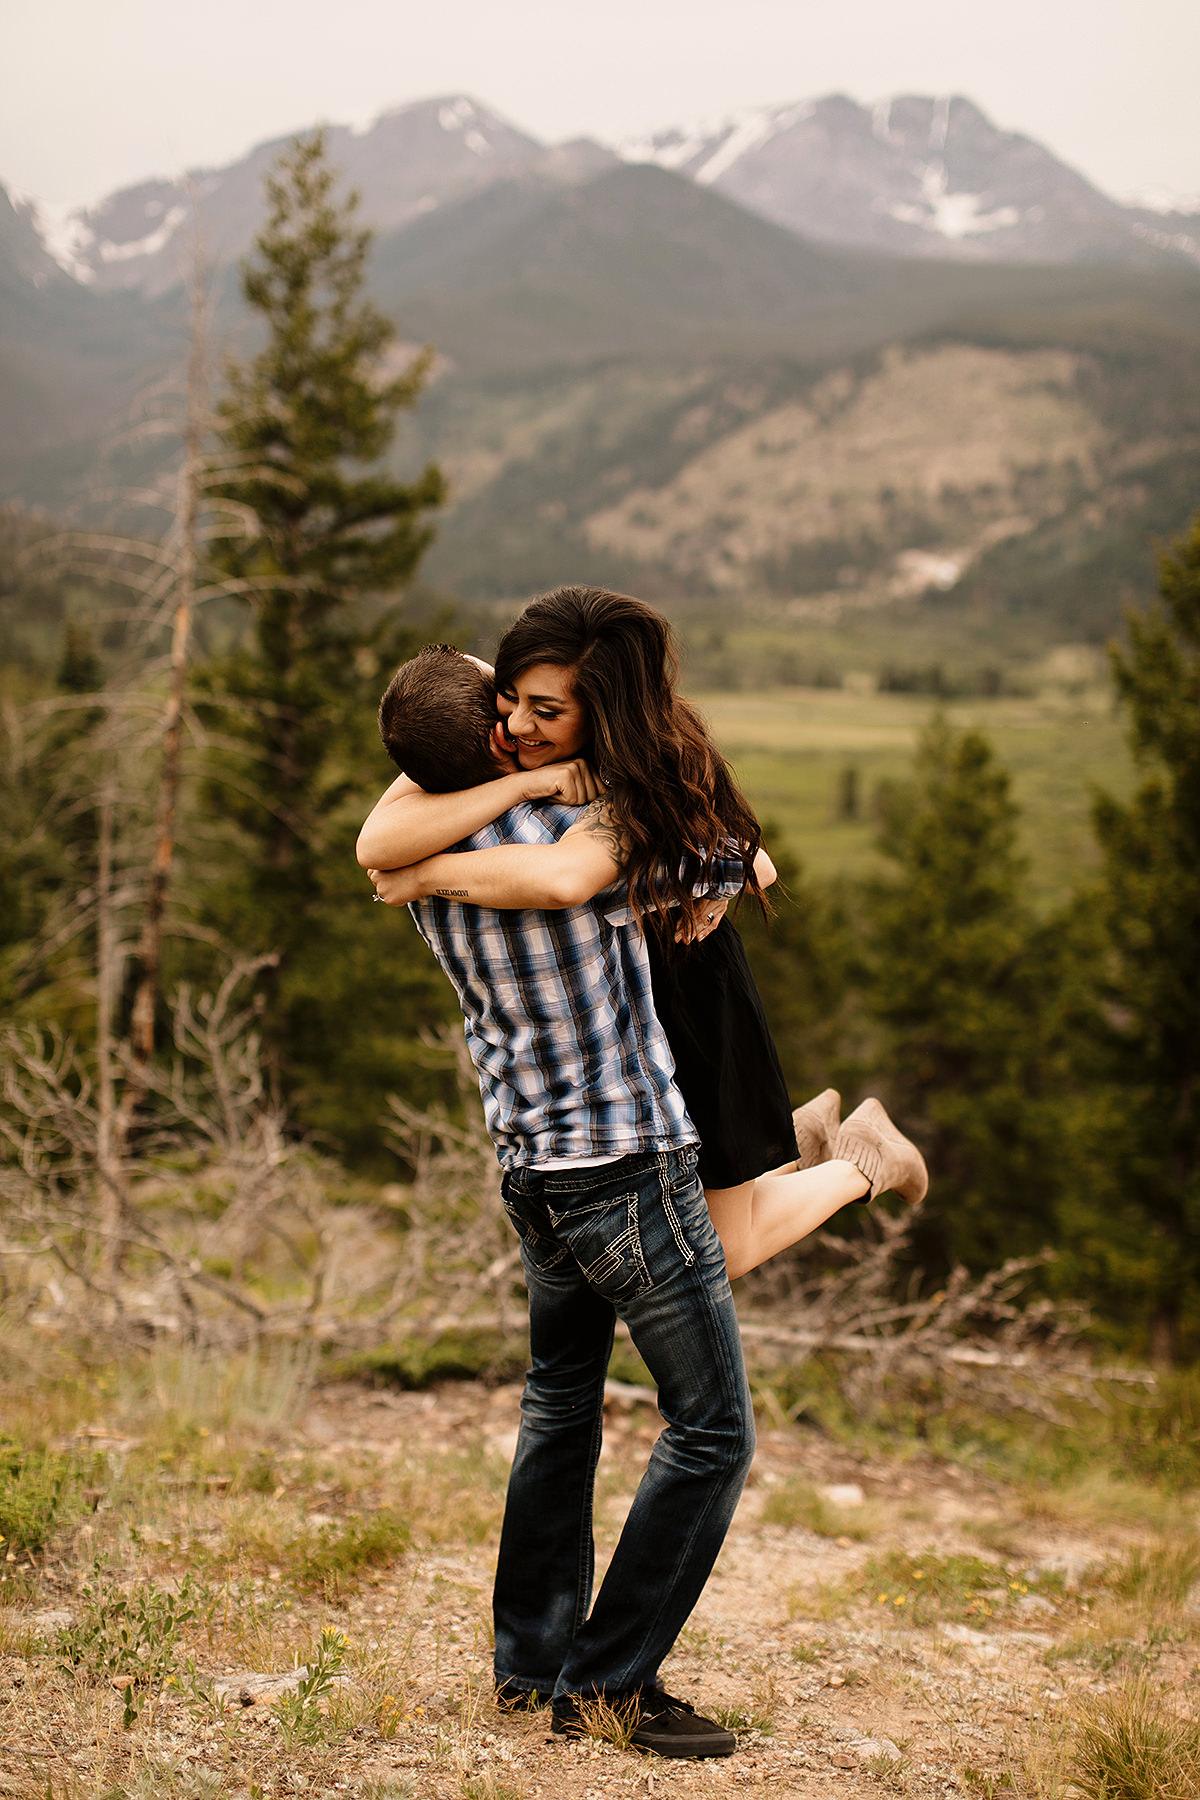 rocky mountain national park photoshoot session photography photographer liz osban colorado engagement elopement love couples film wyoming adventure wedding adrianna devin reikens